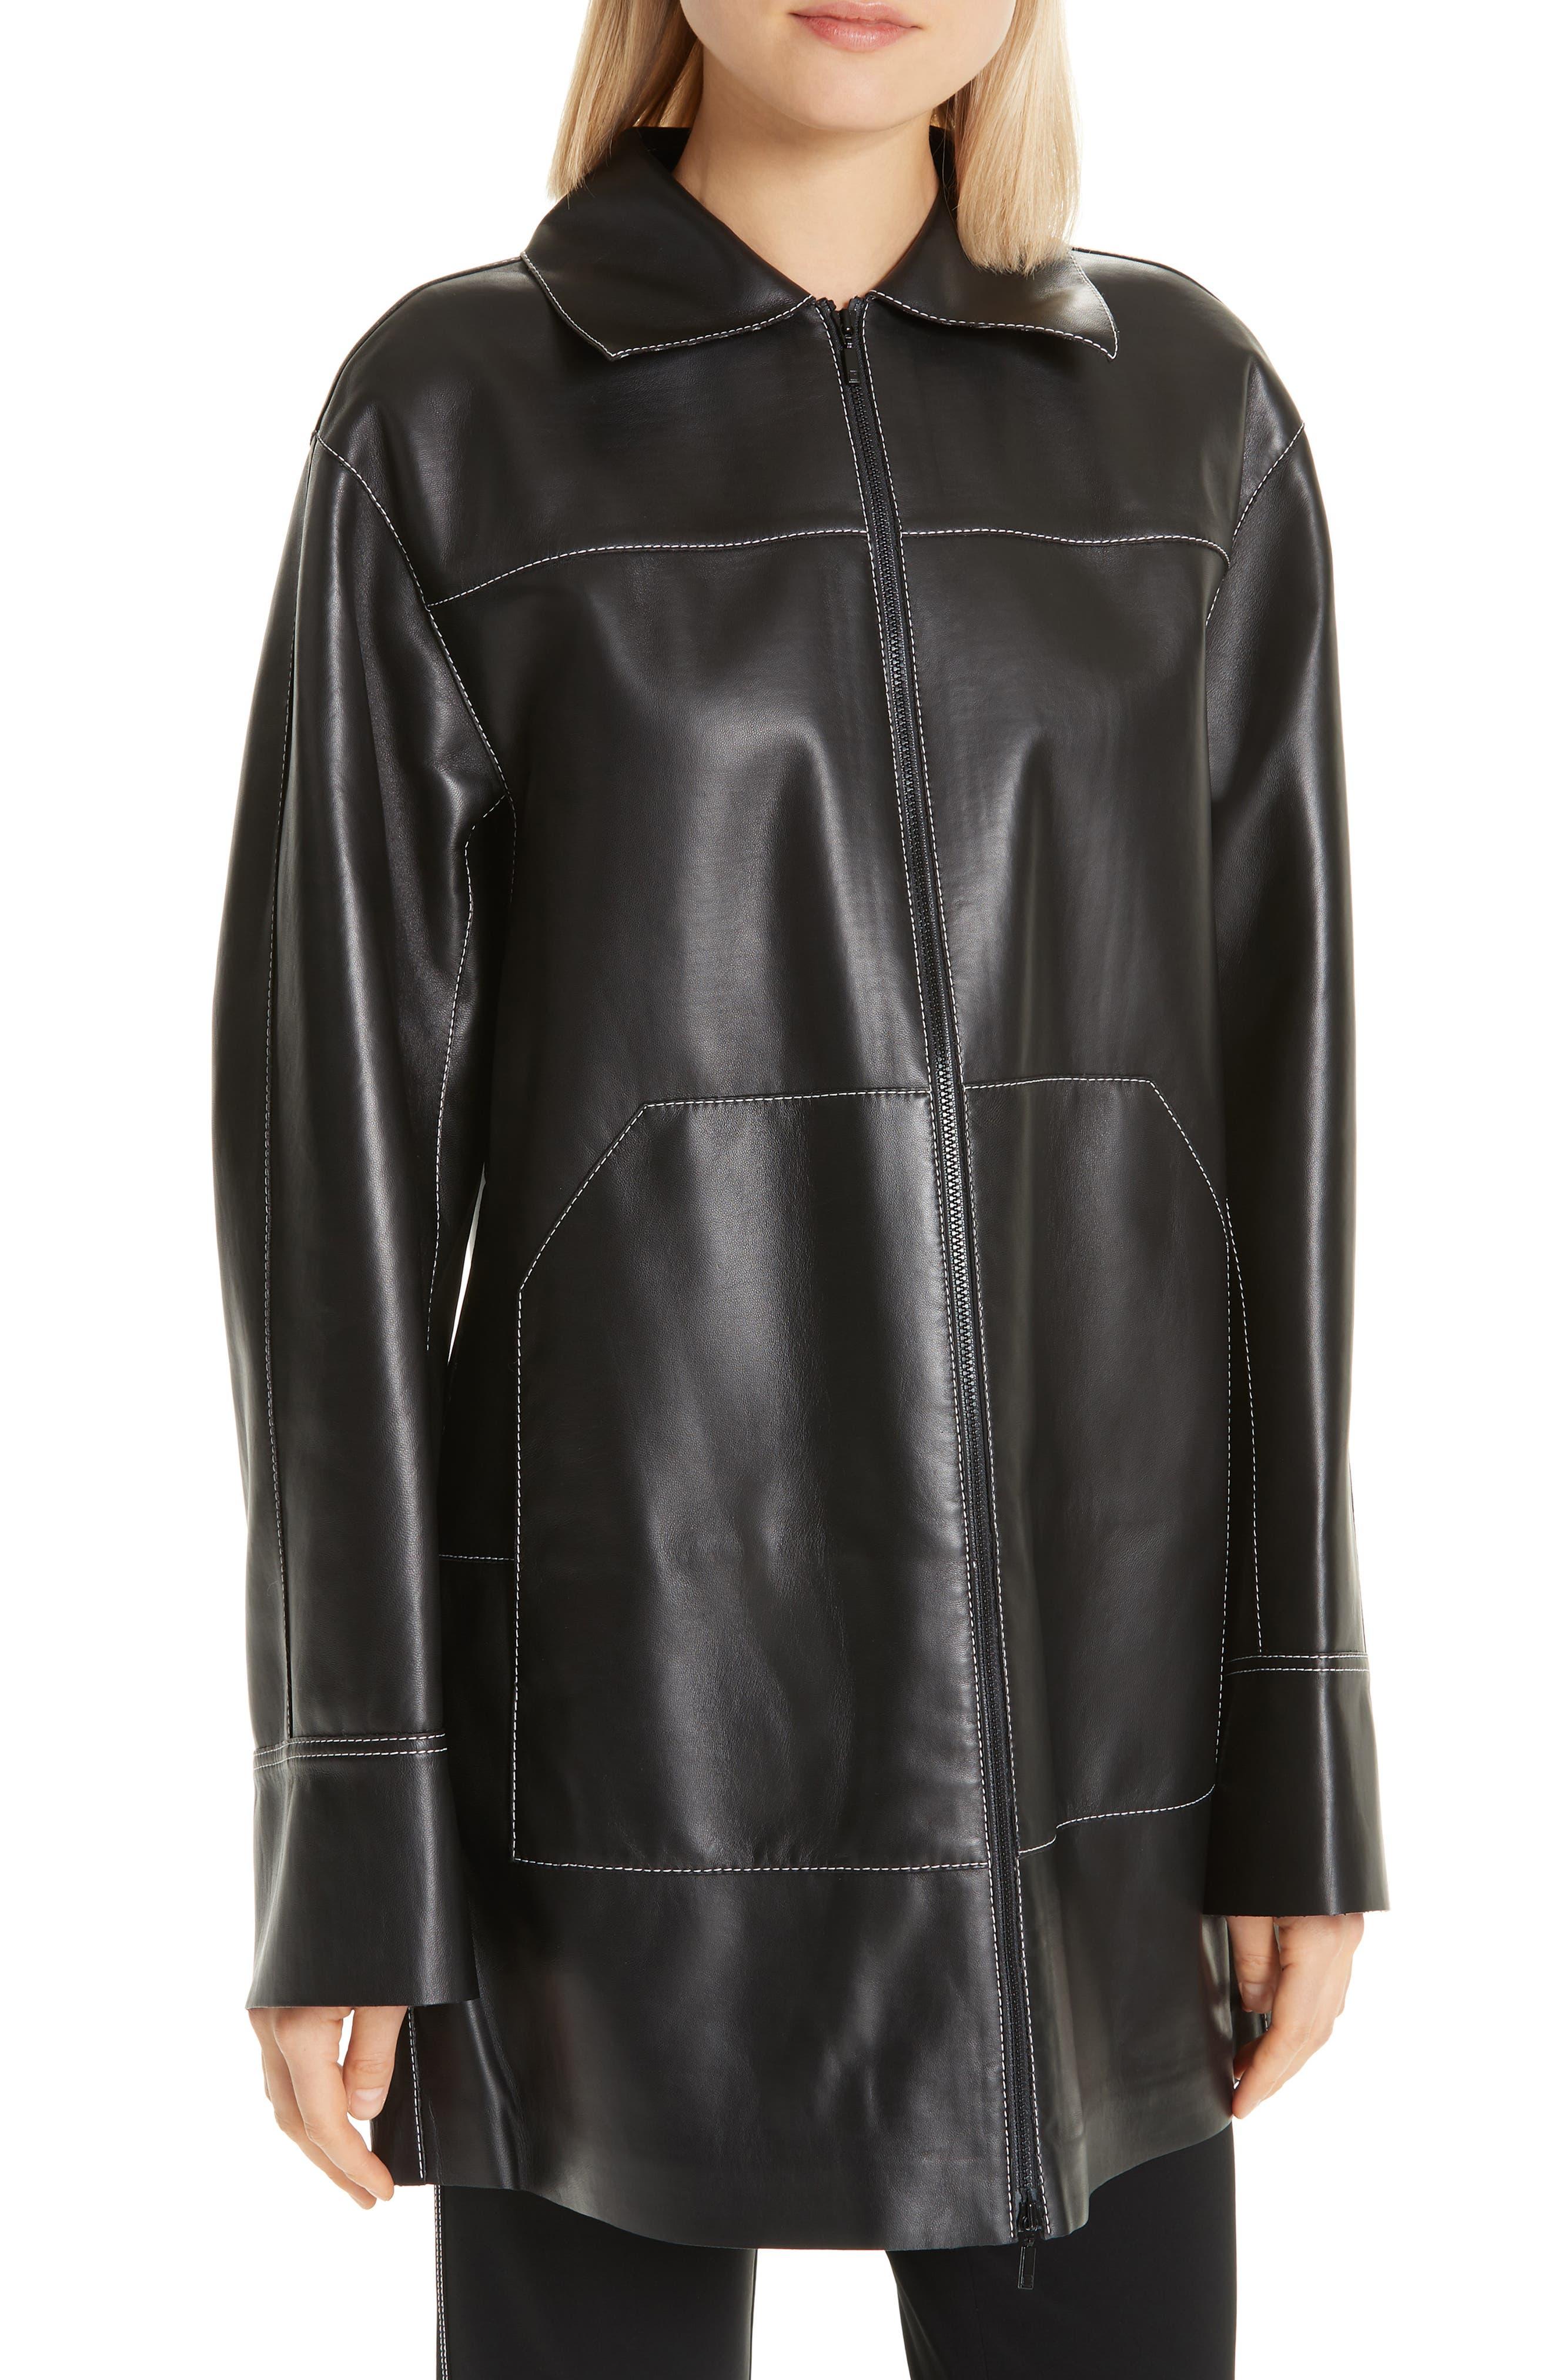 Christopher Leather Jacket,                             Alternate thumbnail 4, color,                             BLACK